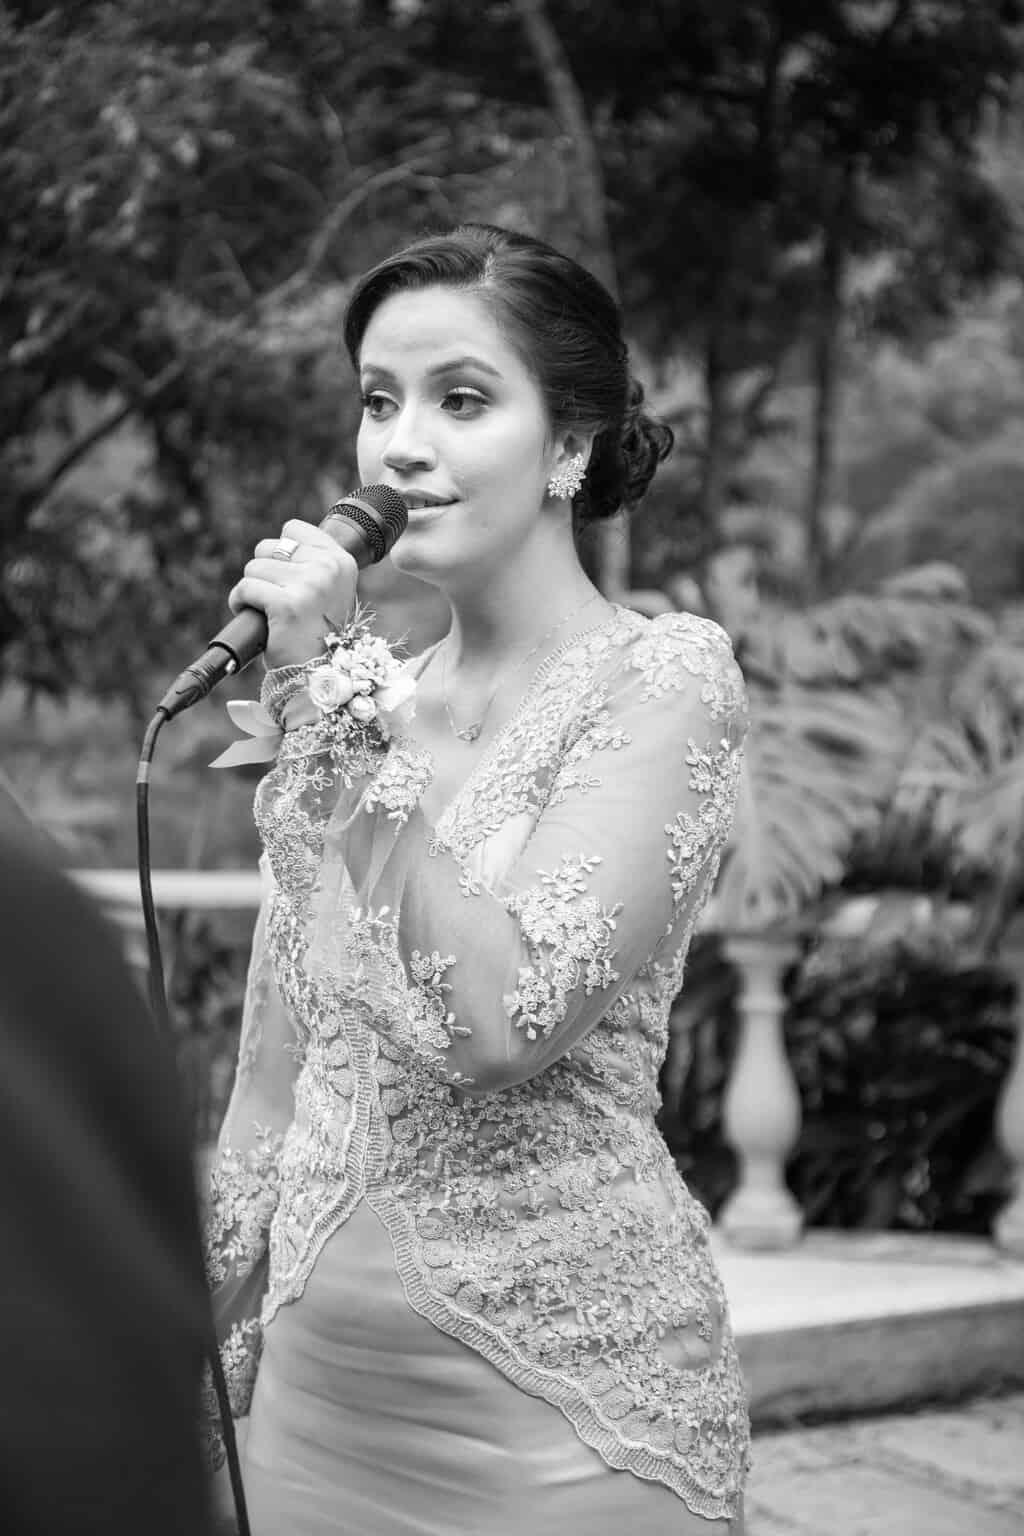 casamento-Beatriz-e-Joao-Fernando-cerimonia-ao-ar-livre-Itaipava-Locanda-Della-Mimosa-Thienny-Tammis128